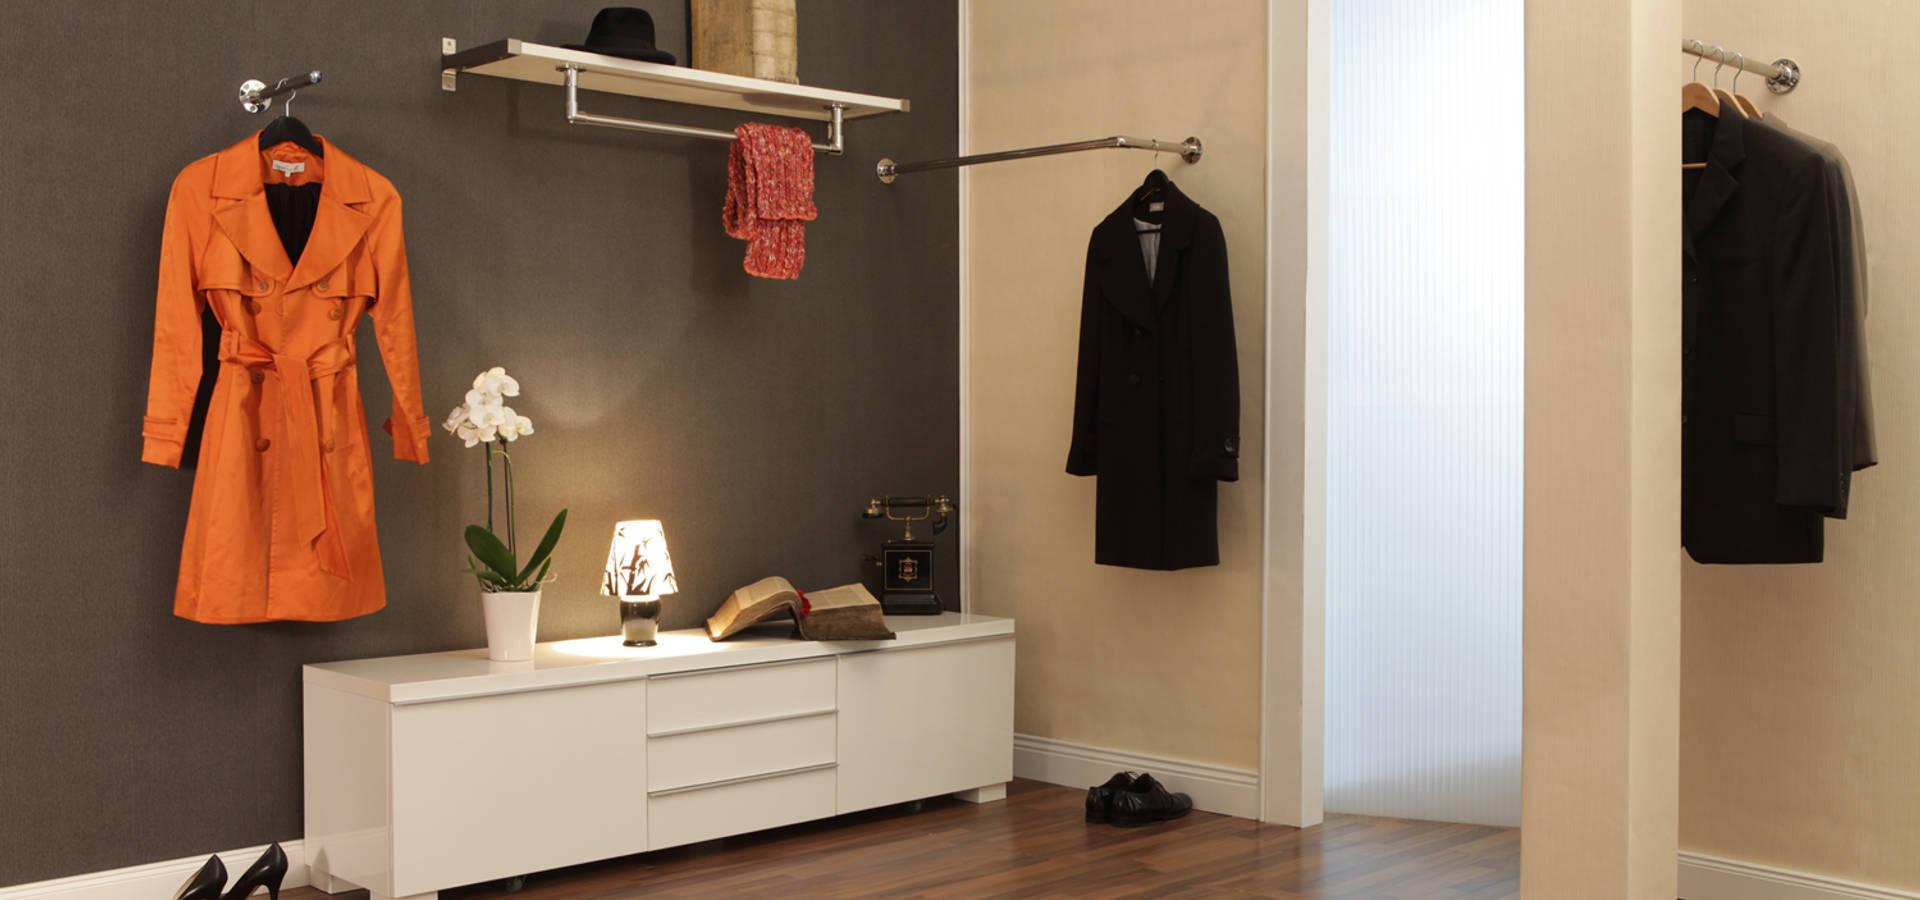 Garderobenstangen f r flur ankleidezimmer oder for Flur garderoben modern